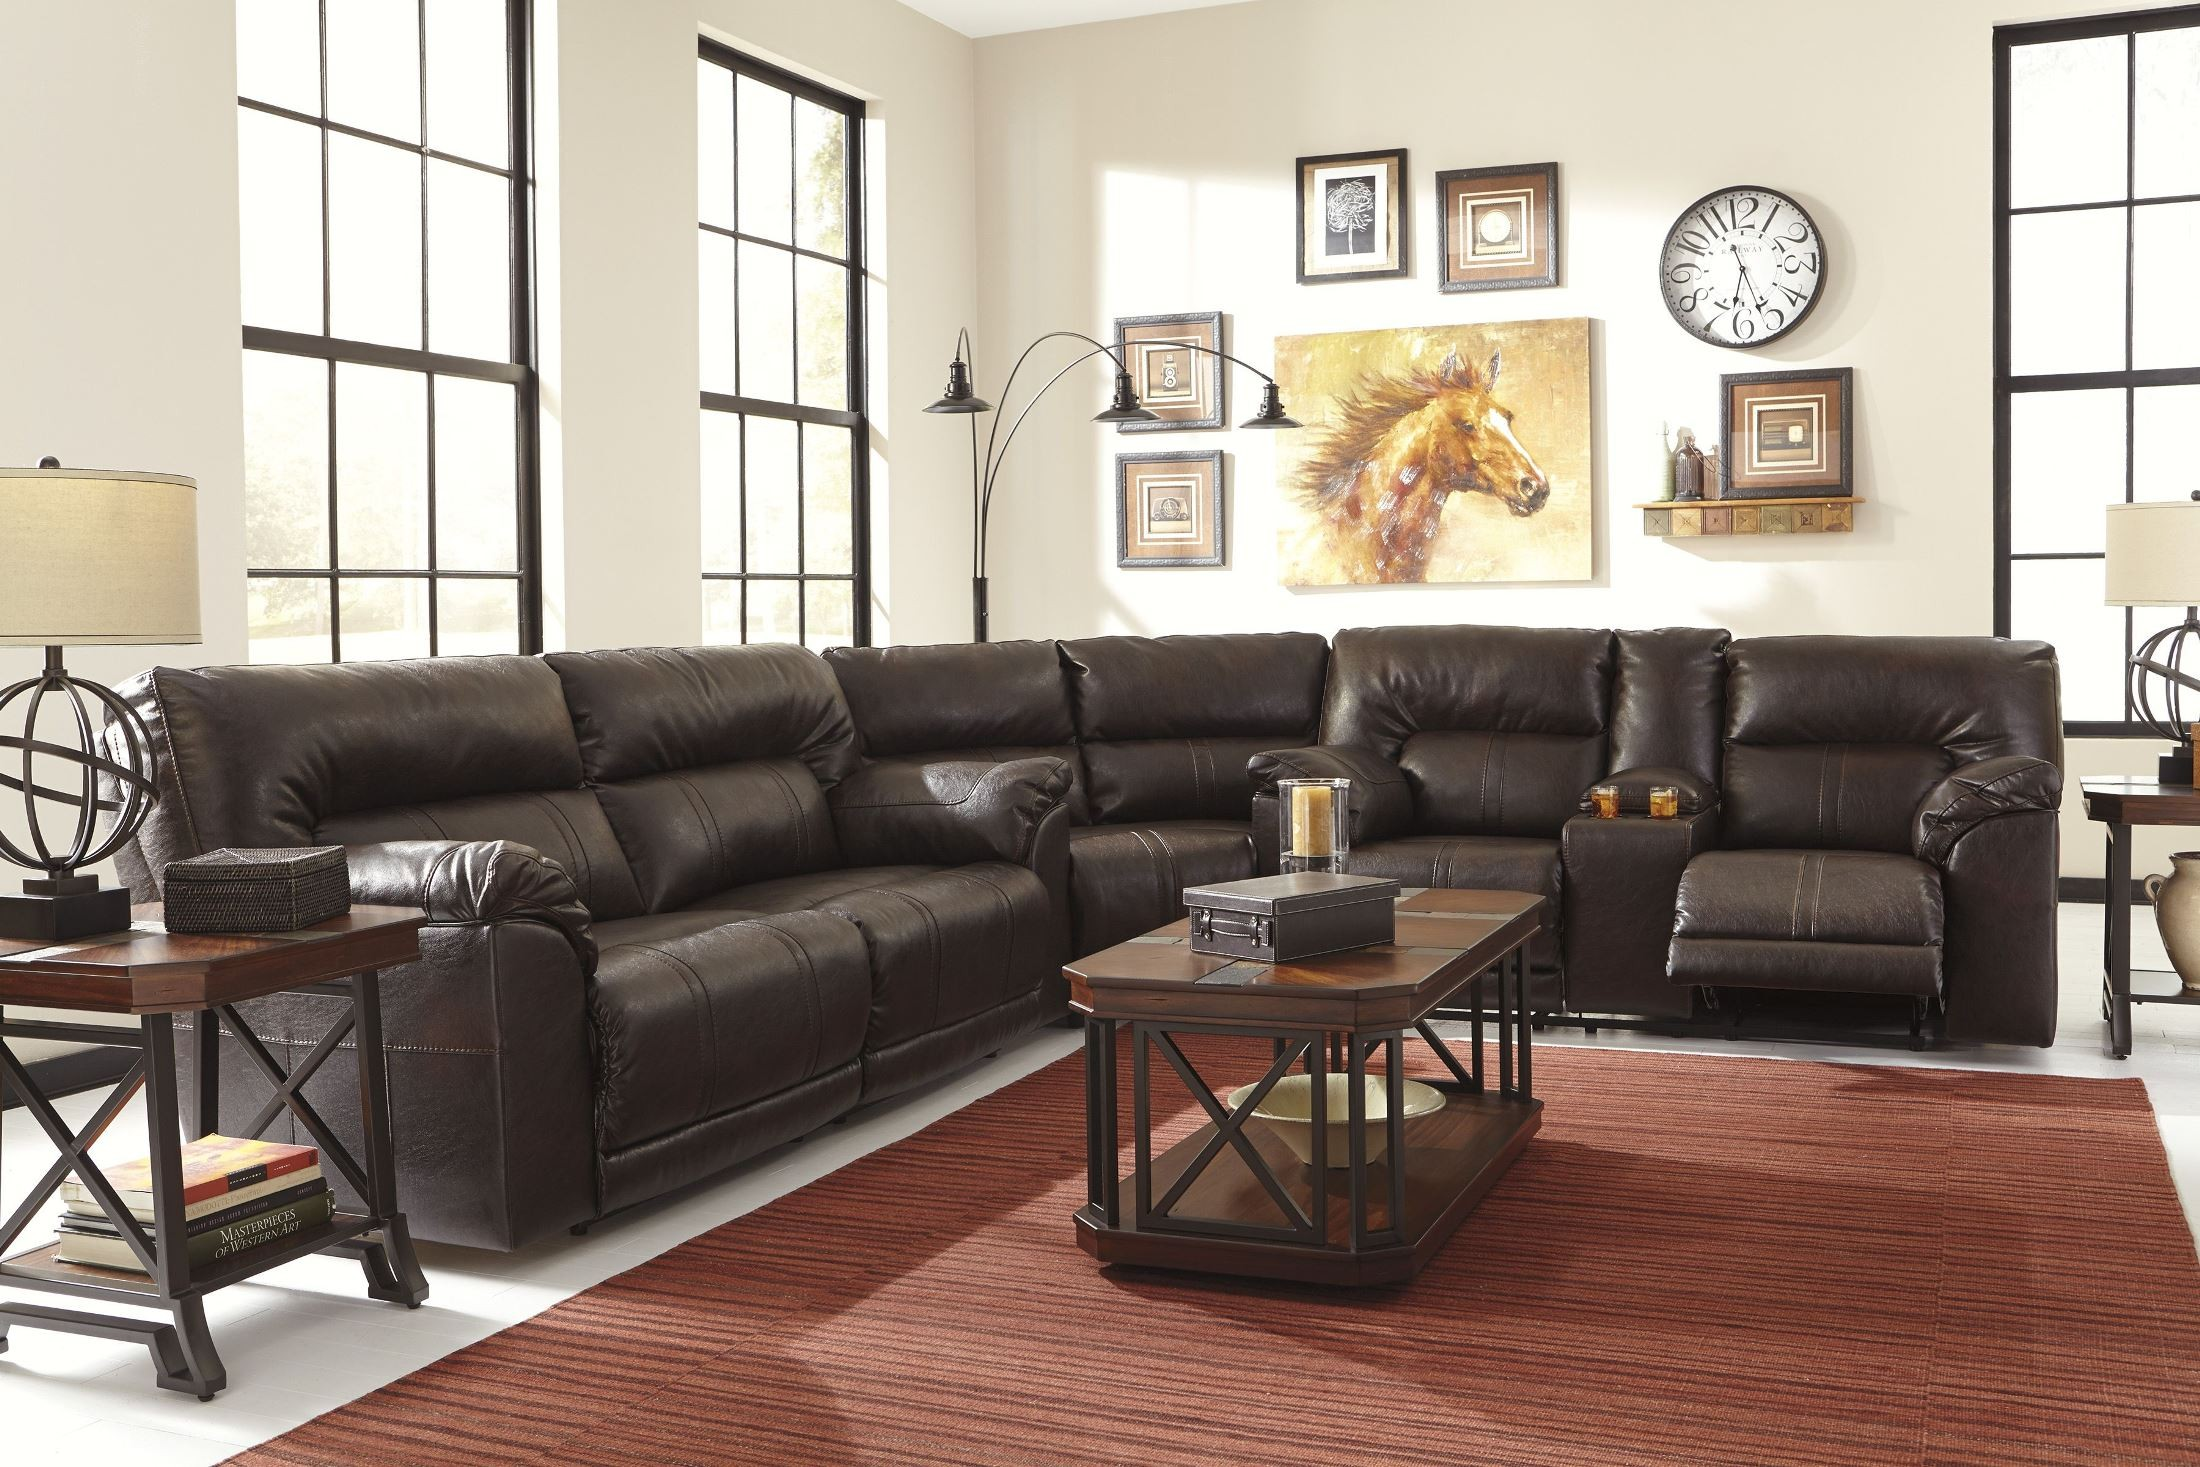 Barrettsville Durablend Chocolate 2 Seat Reclining Sofa